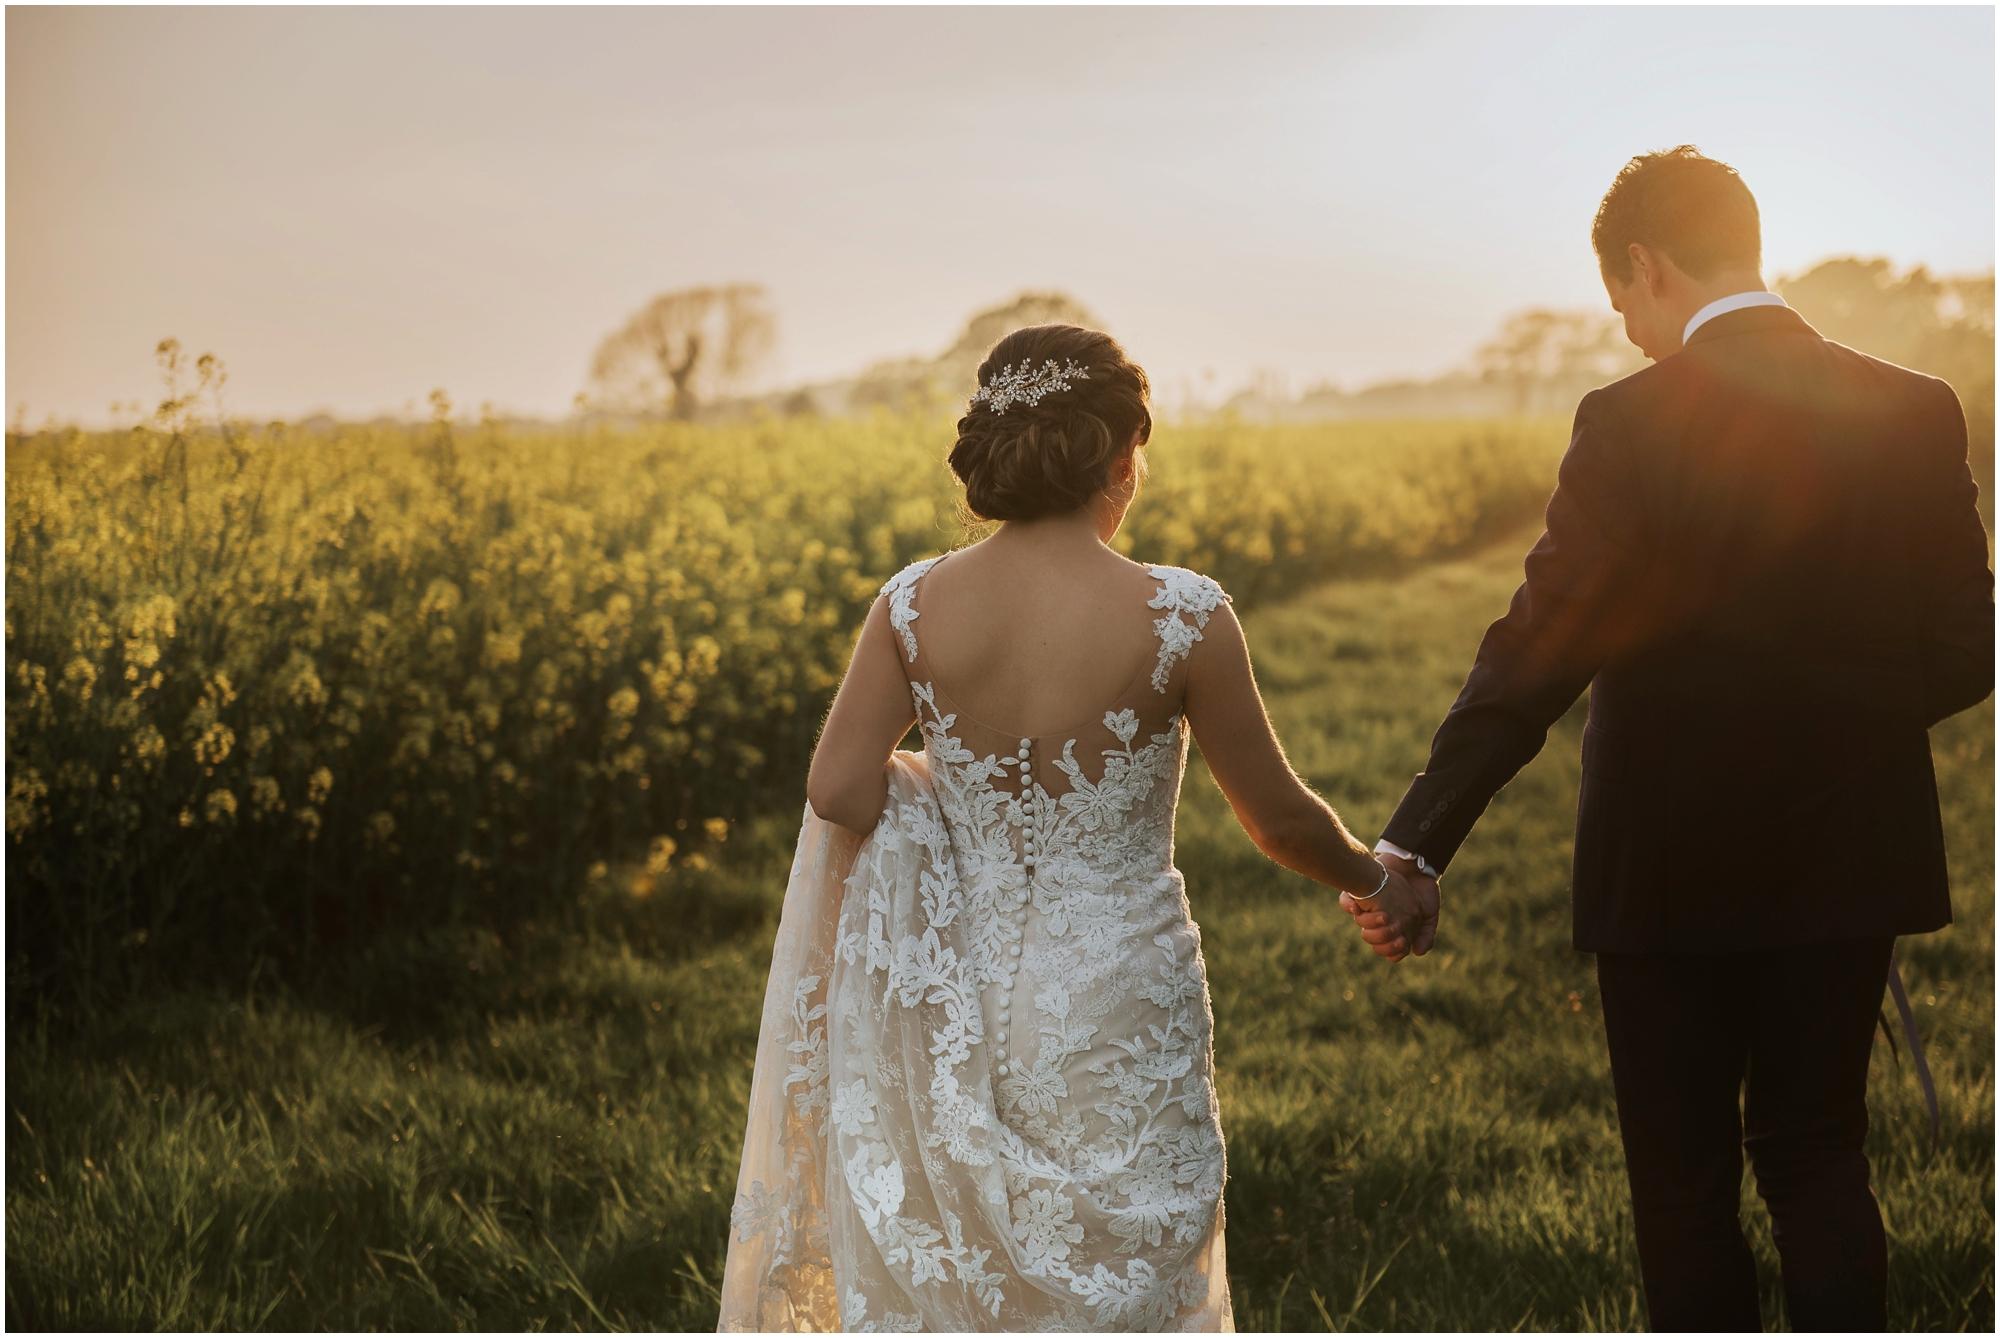 Sopley_Mill_Wedding_SamanthaDavisPhotography024.jpg